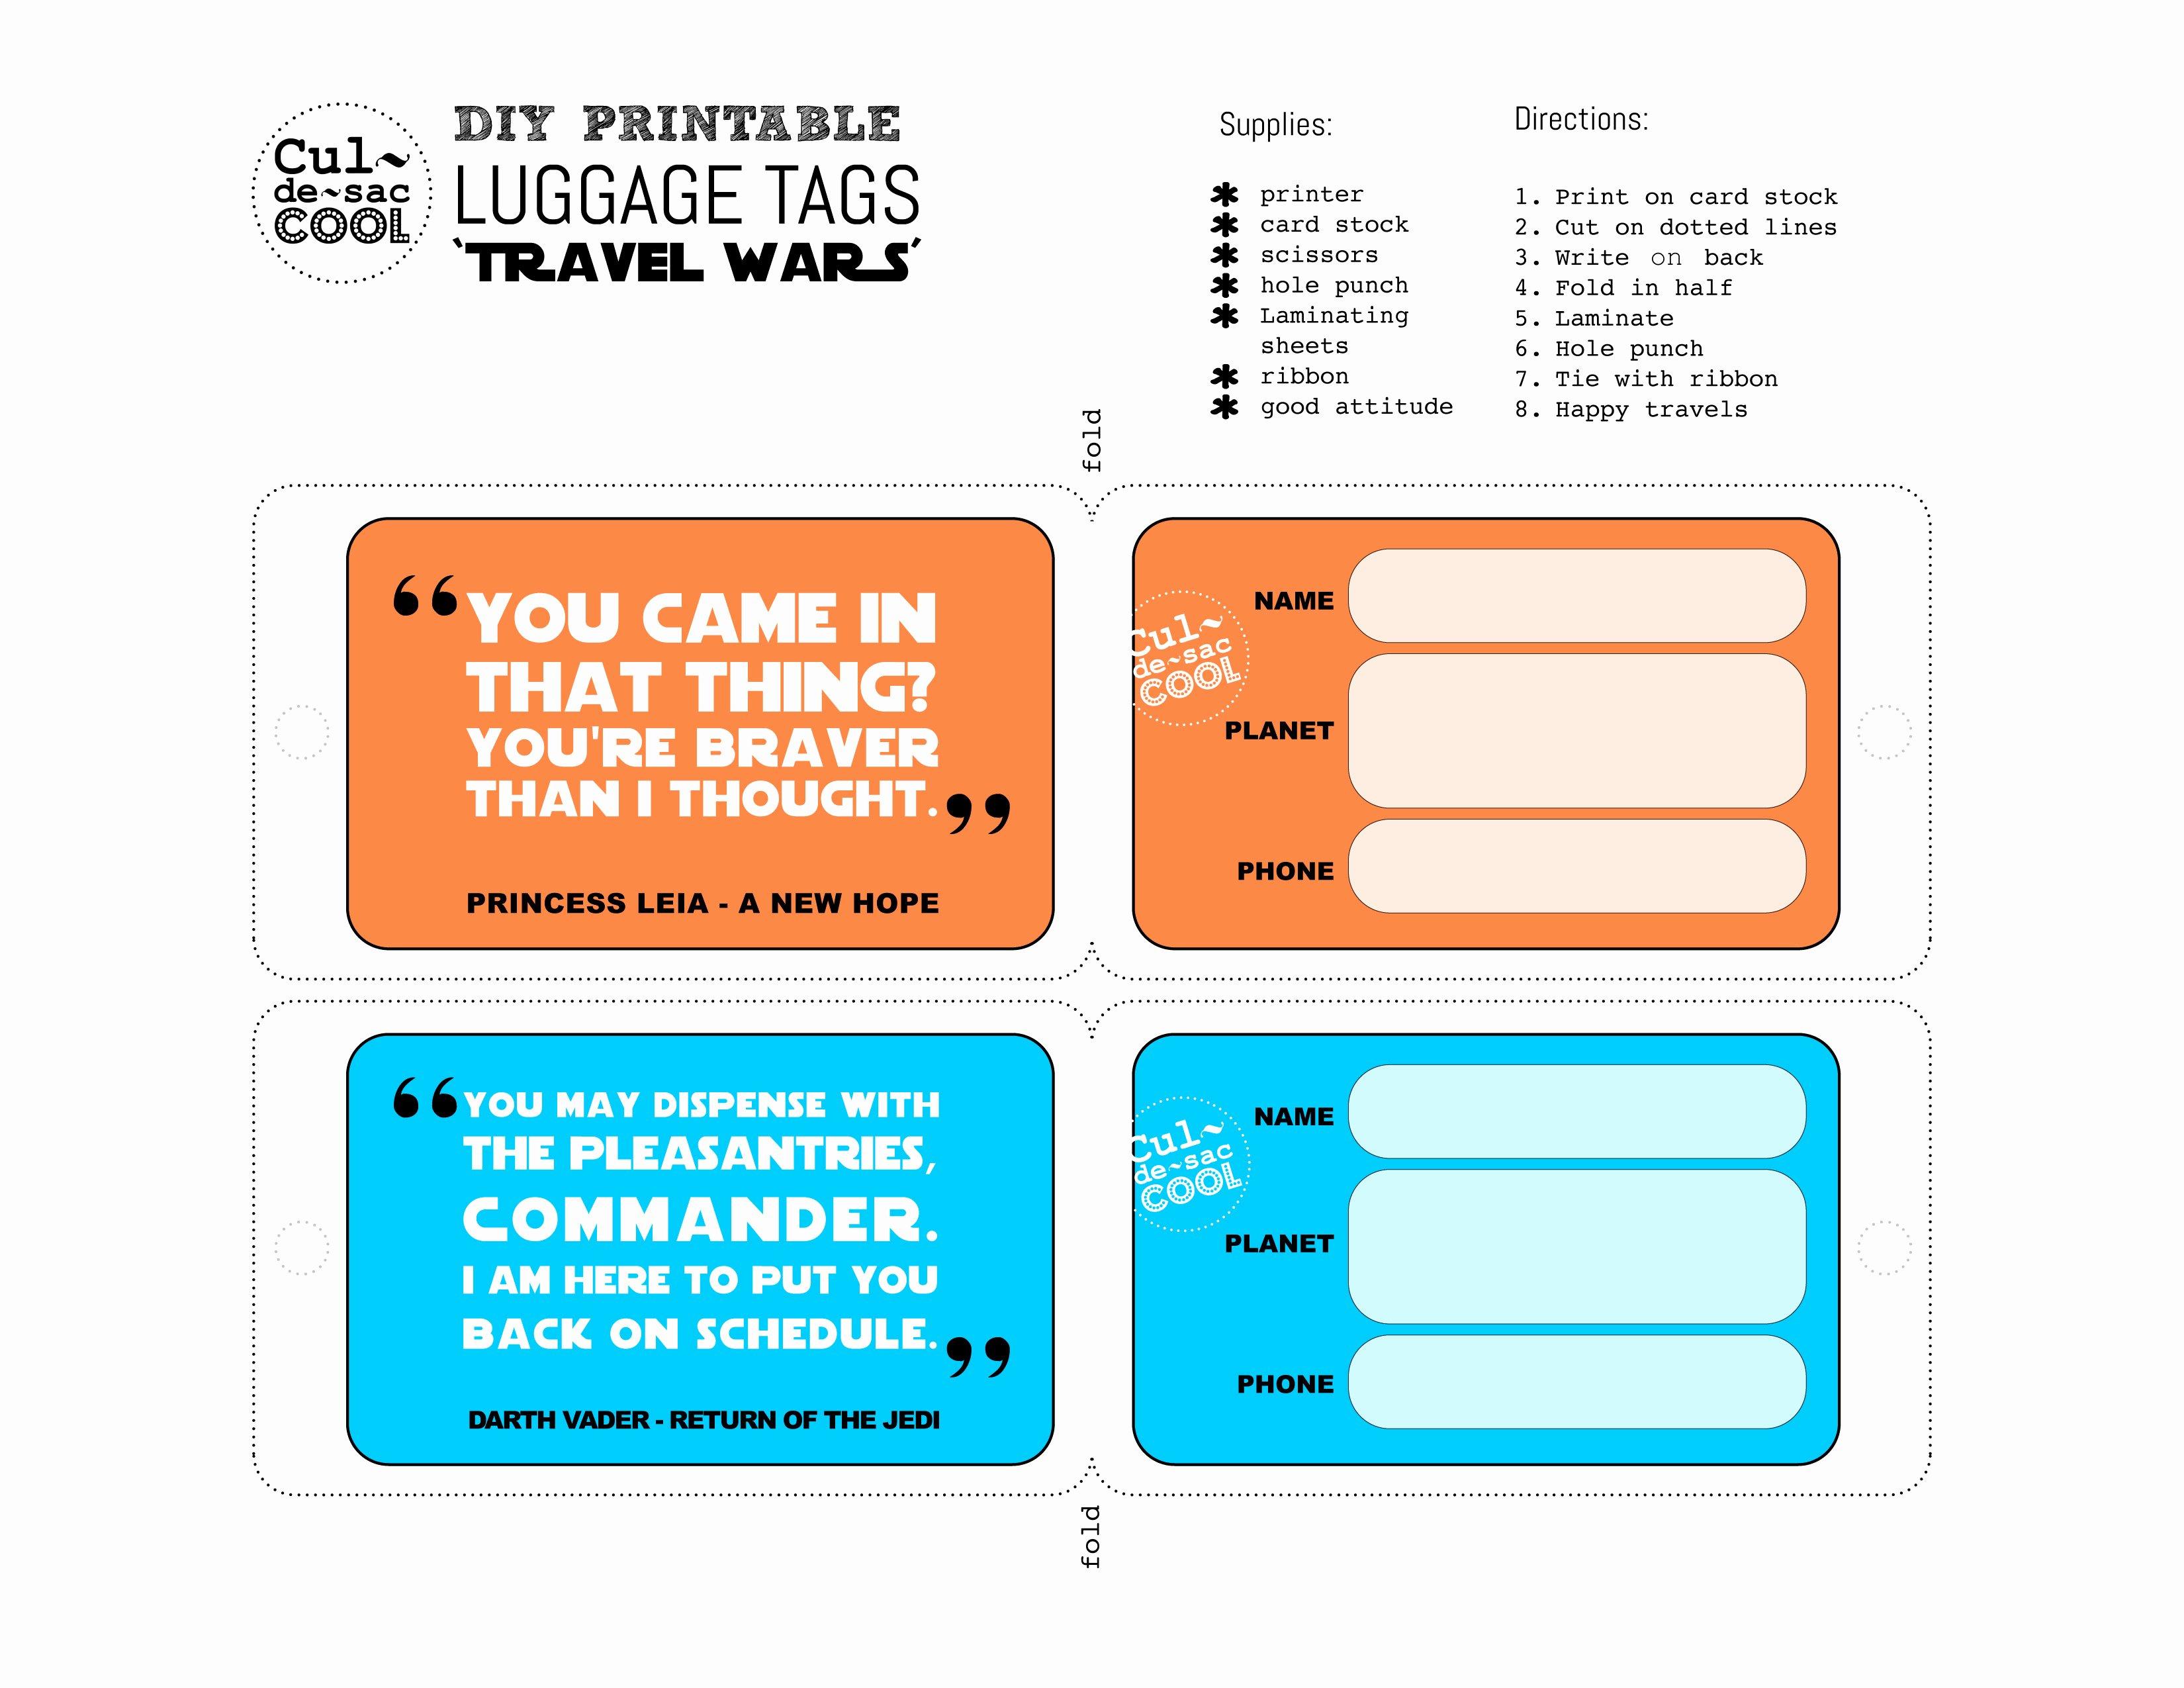 Printable Luggage Tags Template Beautiful Diy Printable Luggage Tags 'travel Wars'